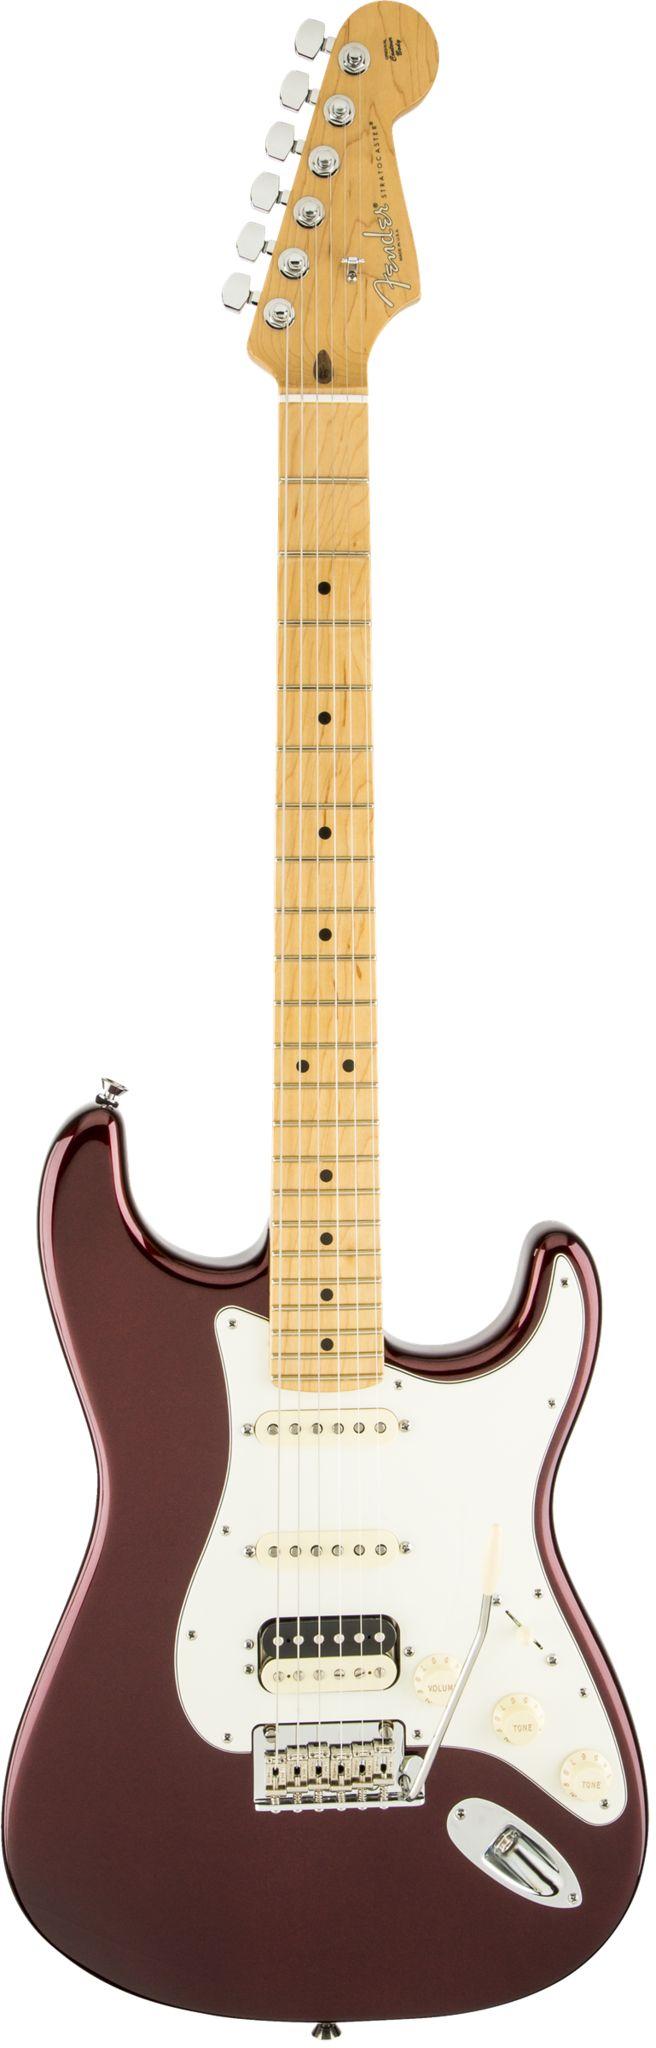 Fender American Standard Shawbucker Stratocaster HSS